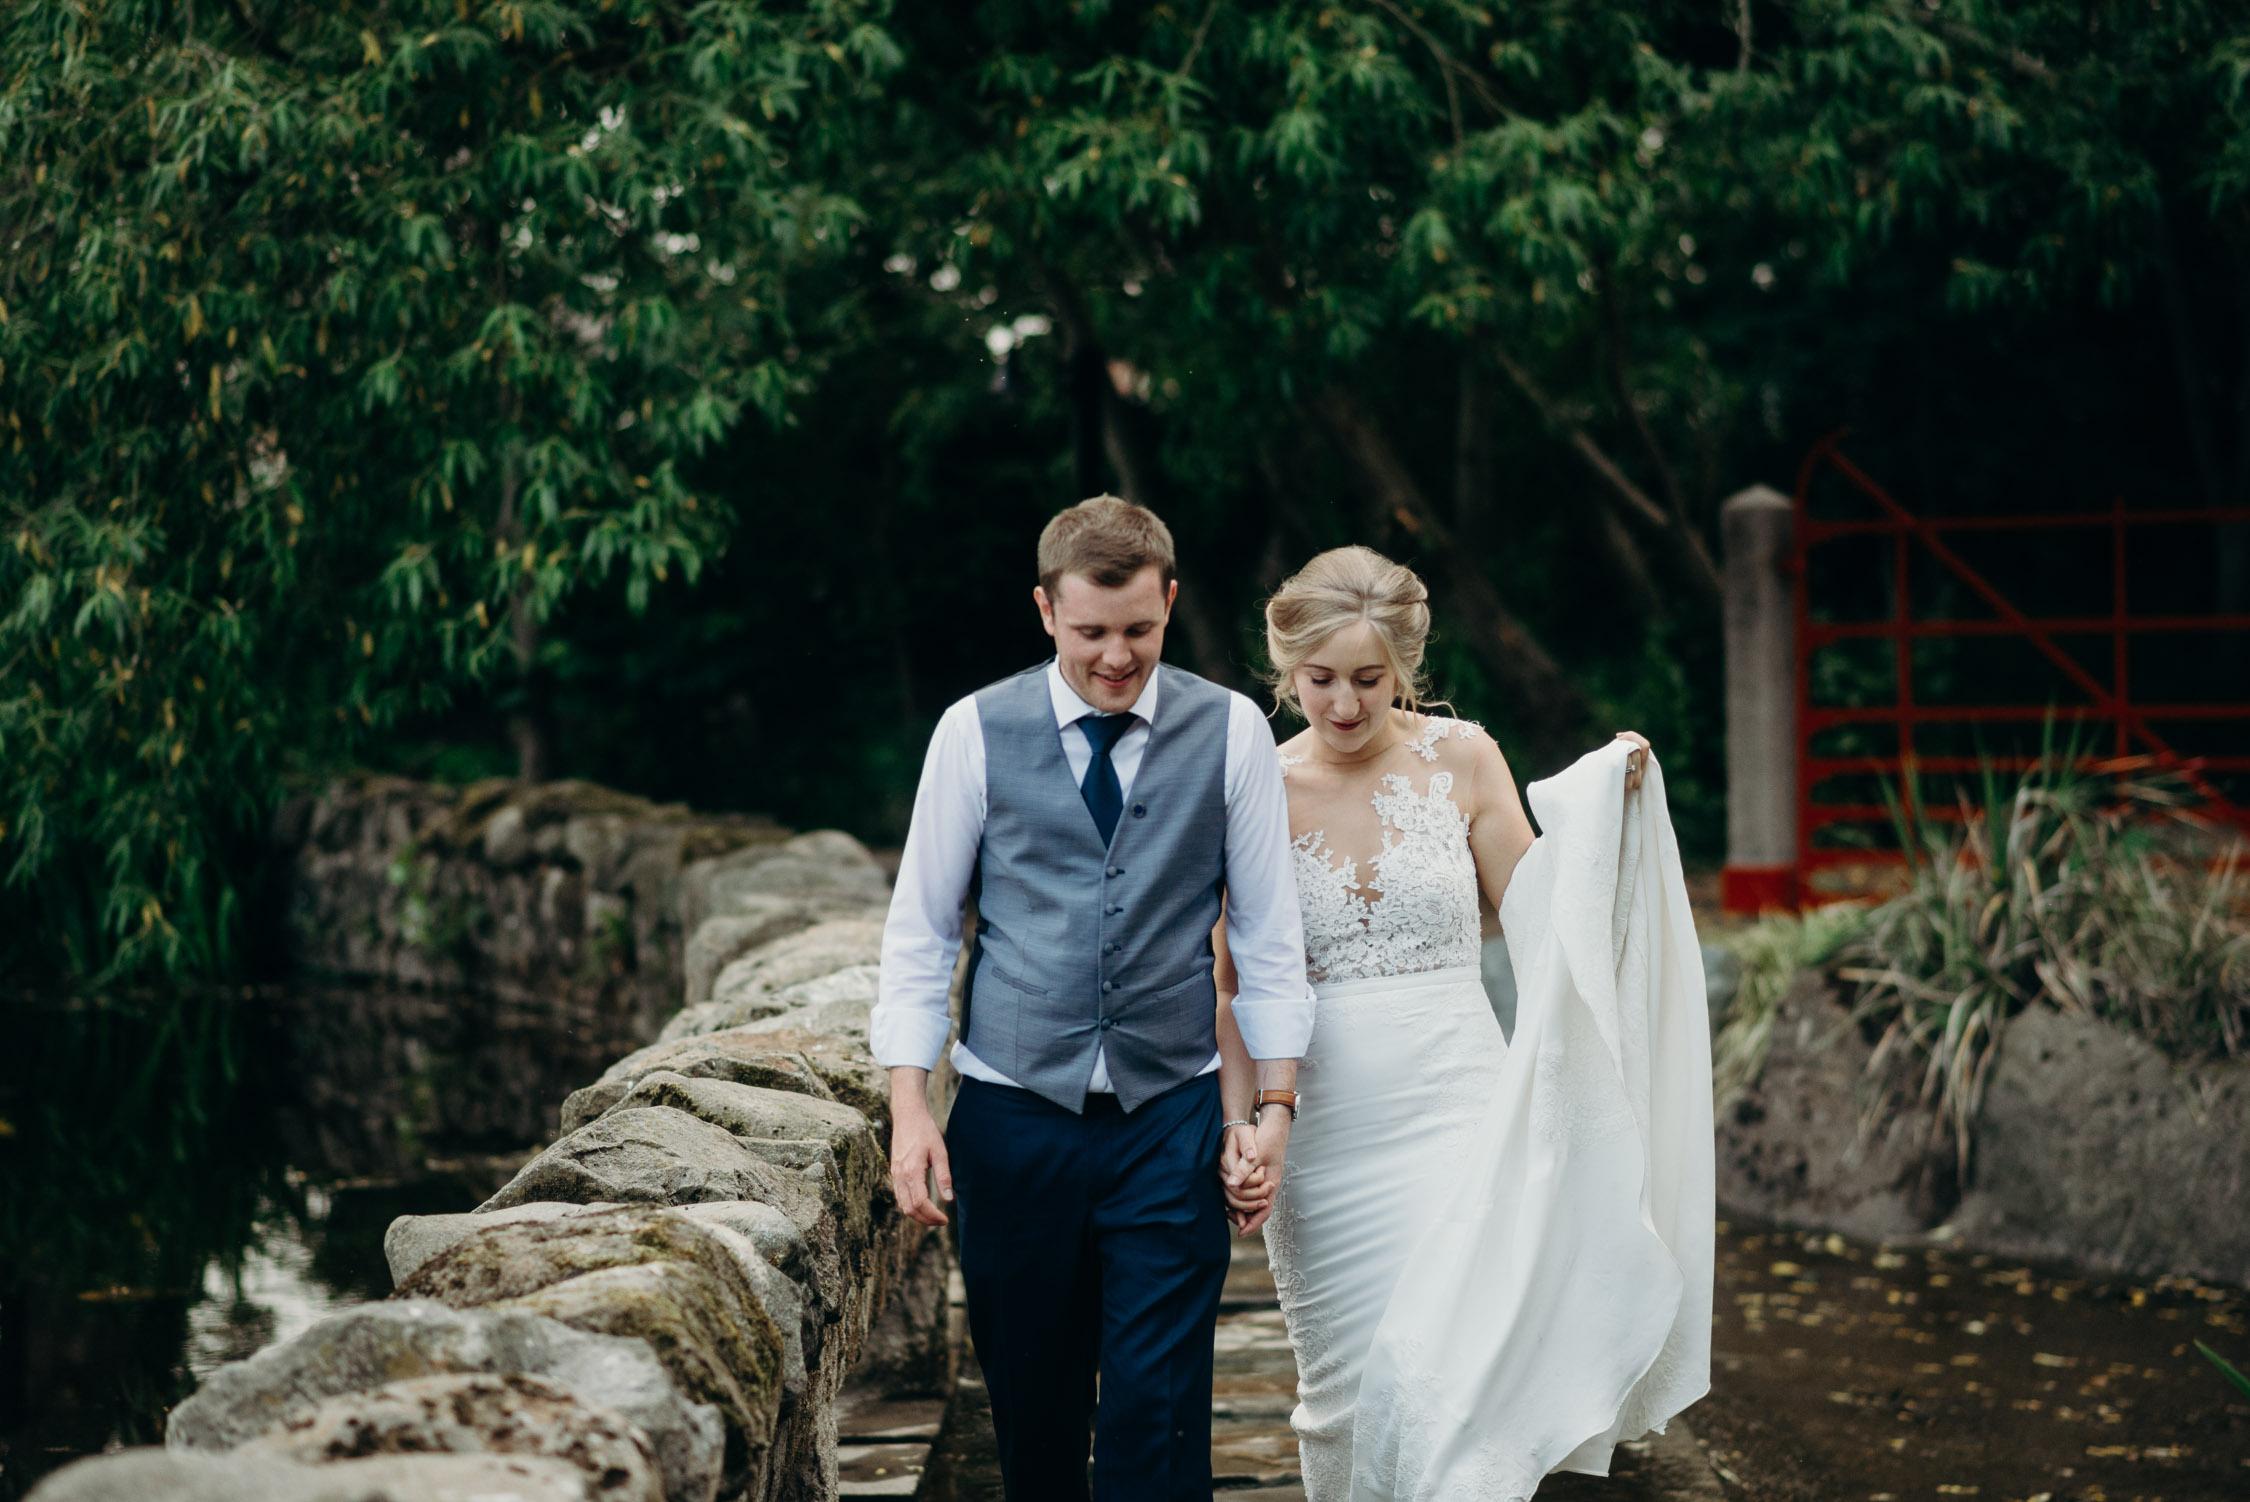 Riverdale wedding photos-162.jpg